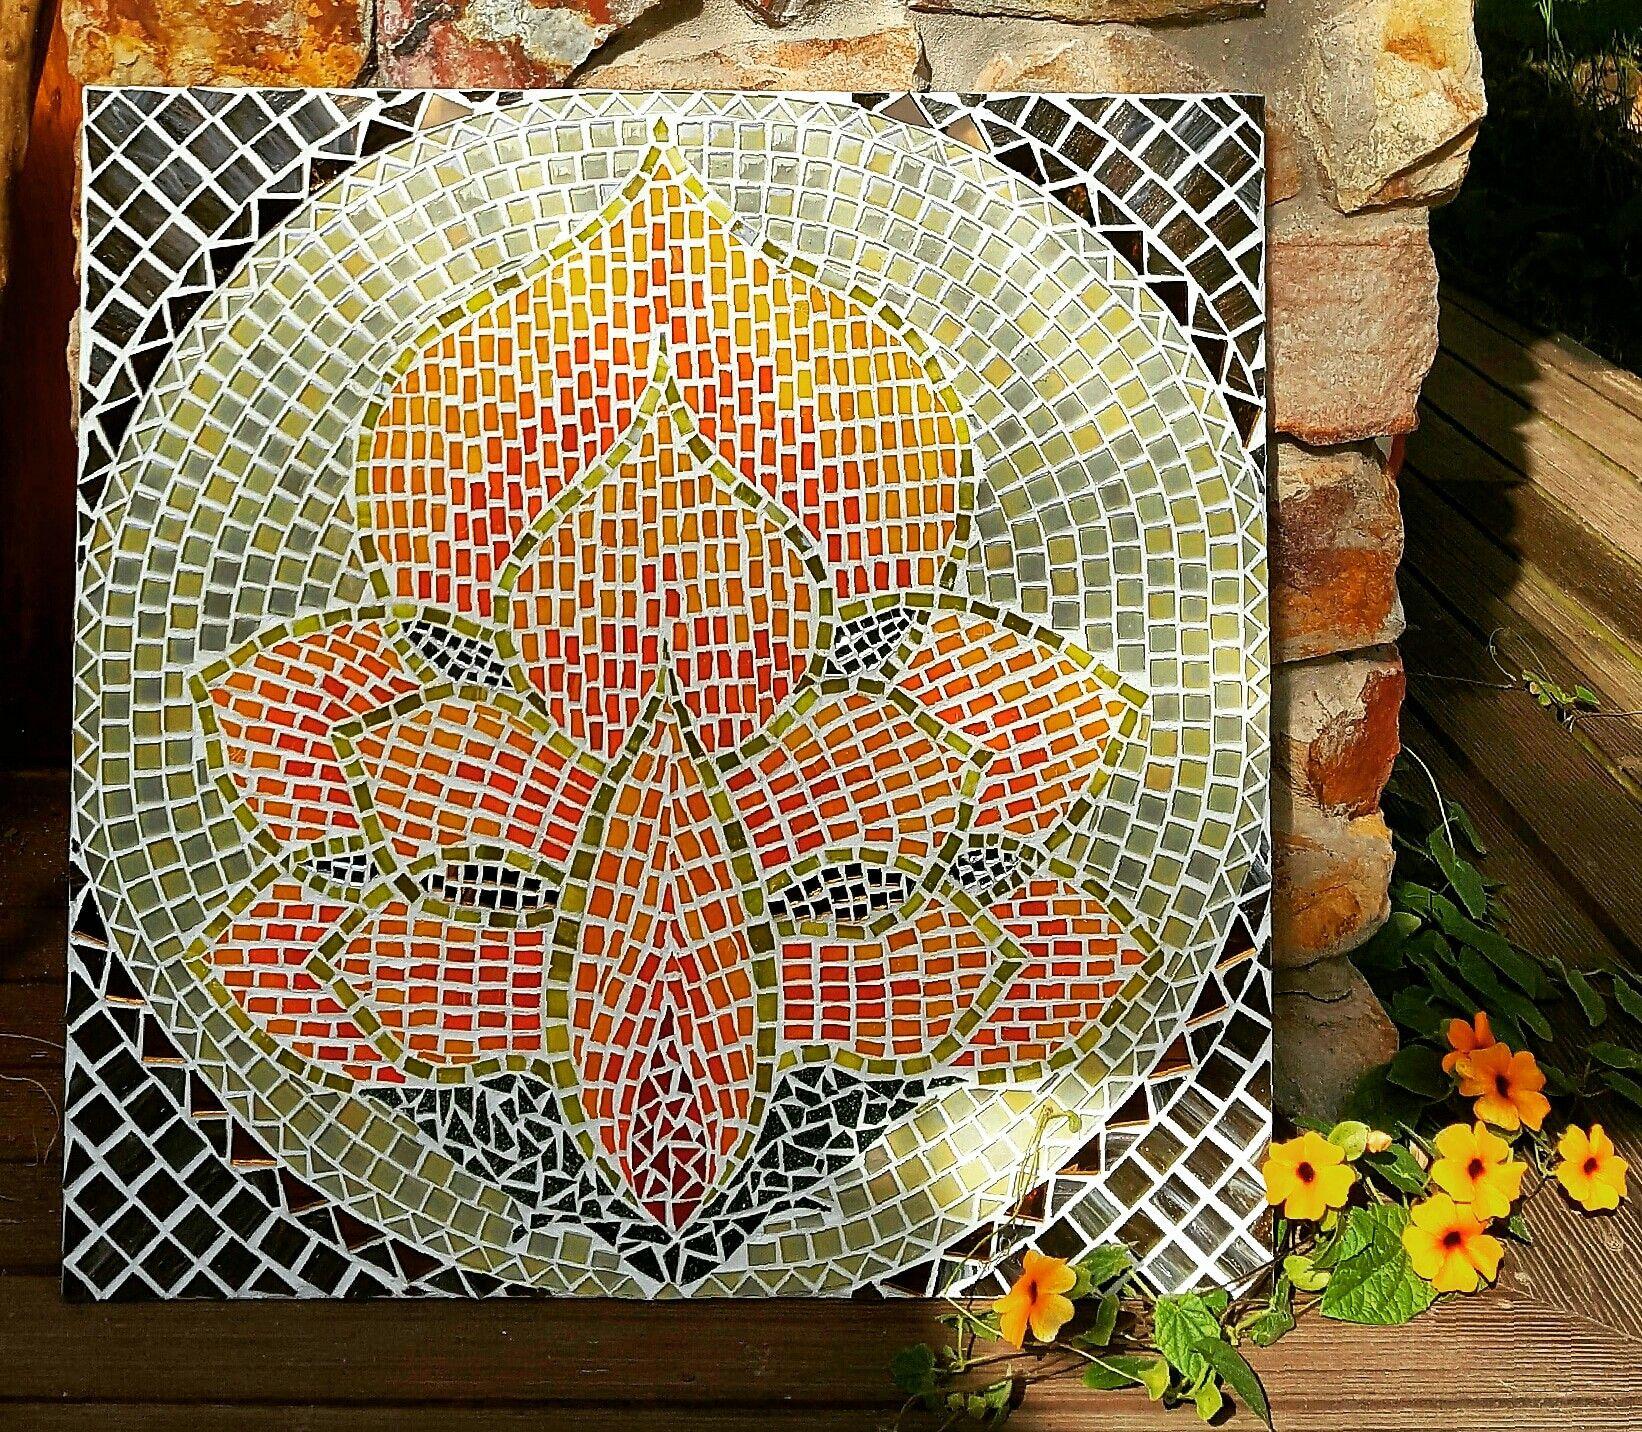 Lotus Flower Mosaic By Jo Holmwood Mozaic Ideas Pinterest Mosaics